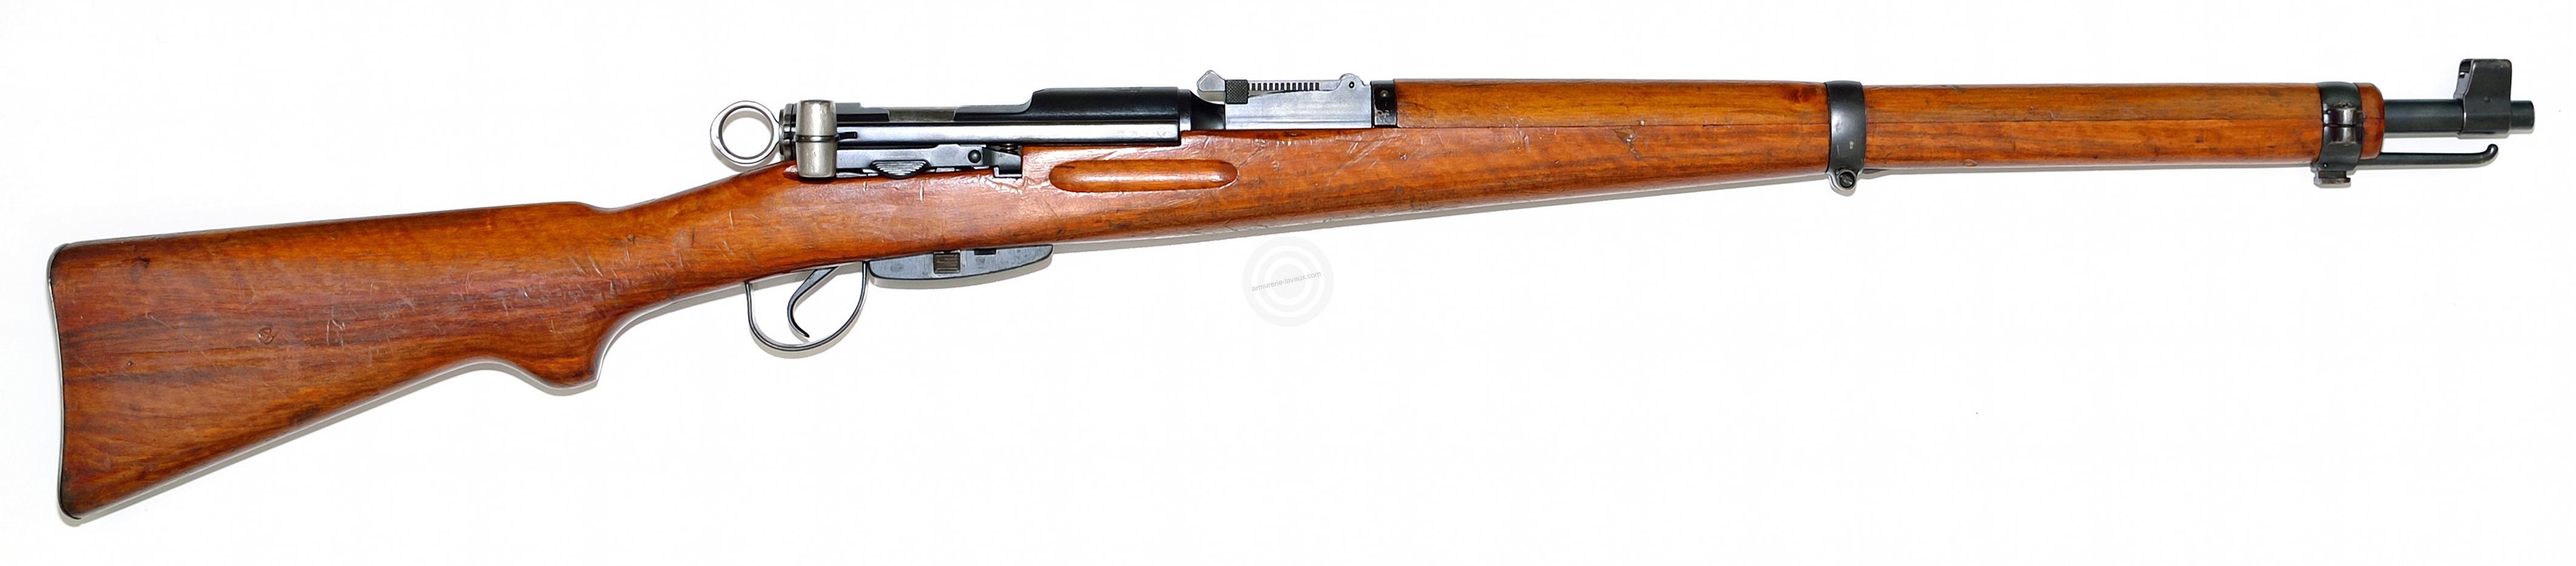 Carabine mousqueton K31 Swiss cal.7.5x55 Swiss (TRES BON)